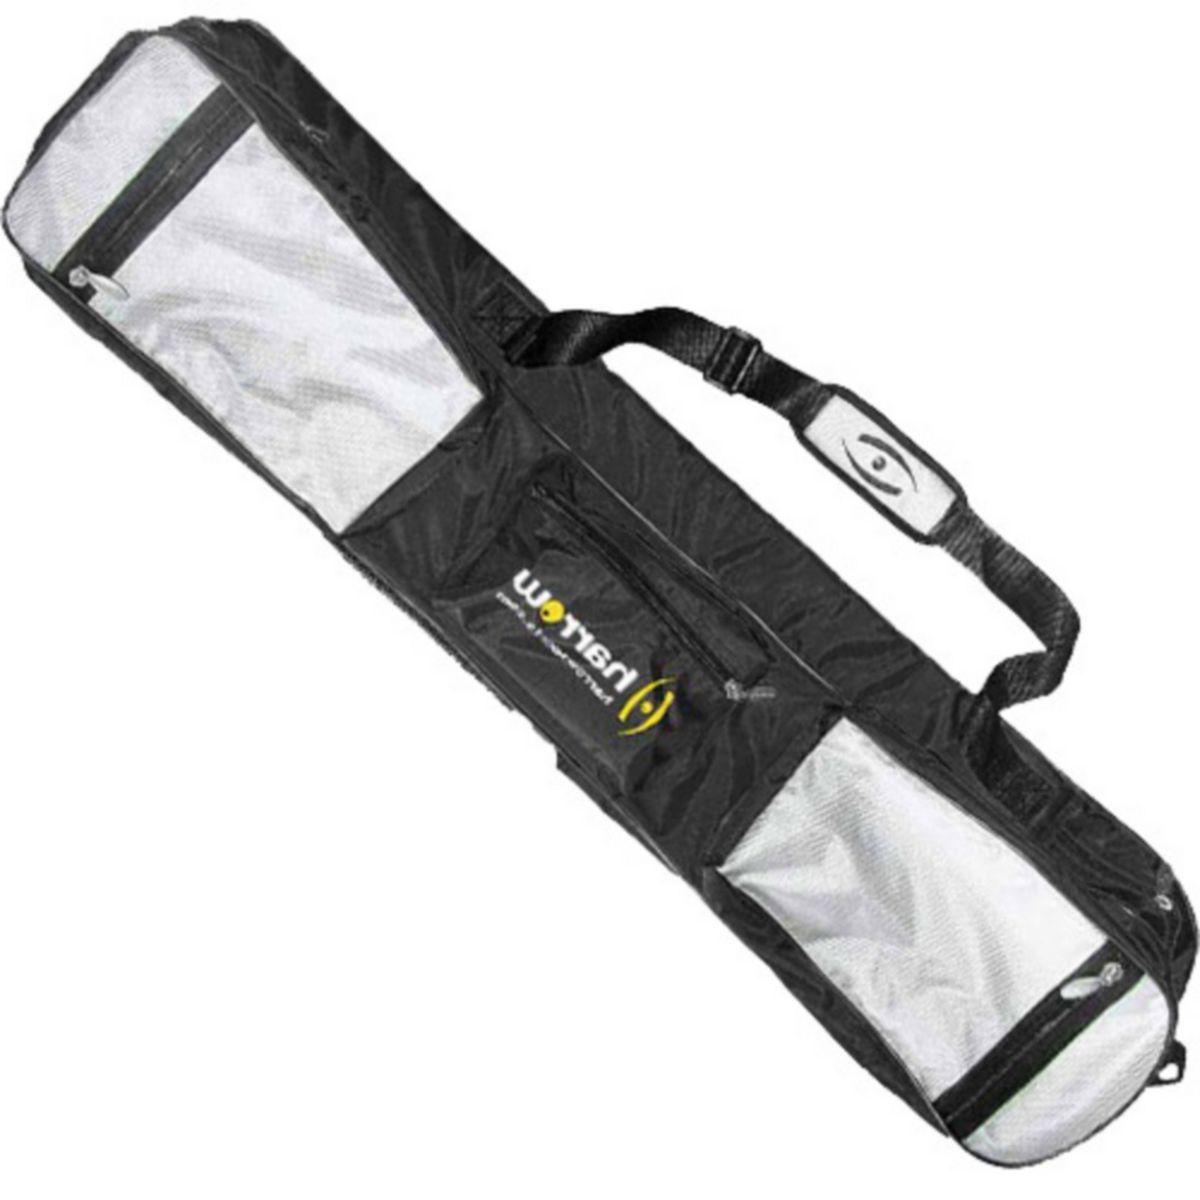 Harrow Blitz 4000 Deluxe Field Stick Bag